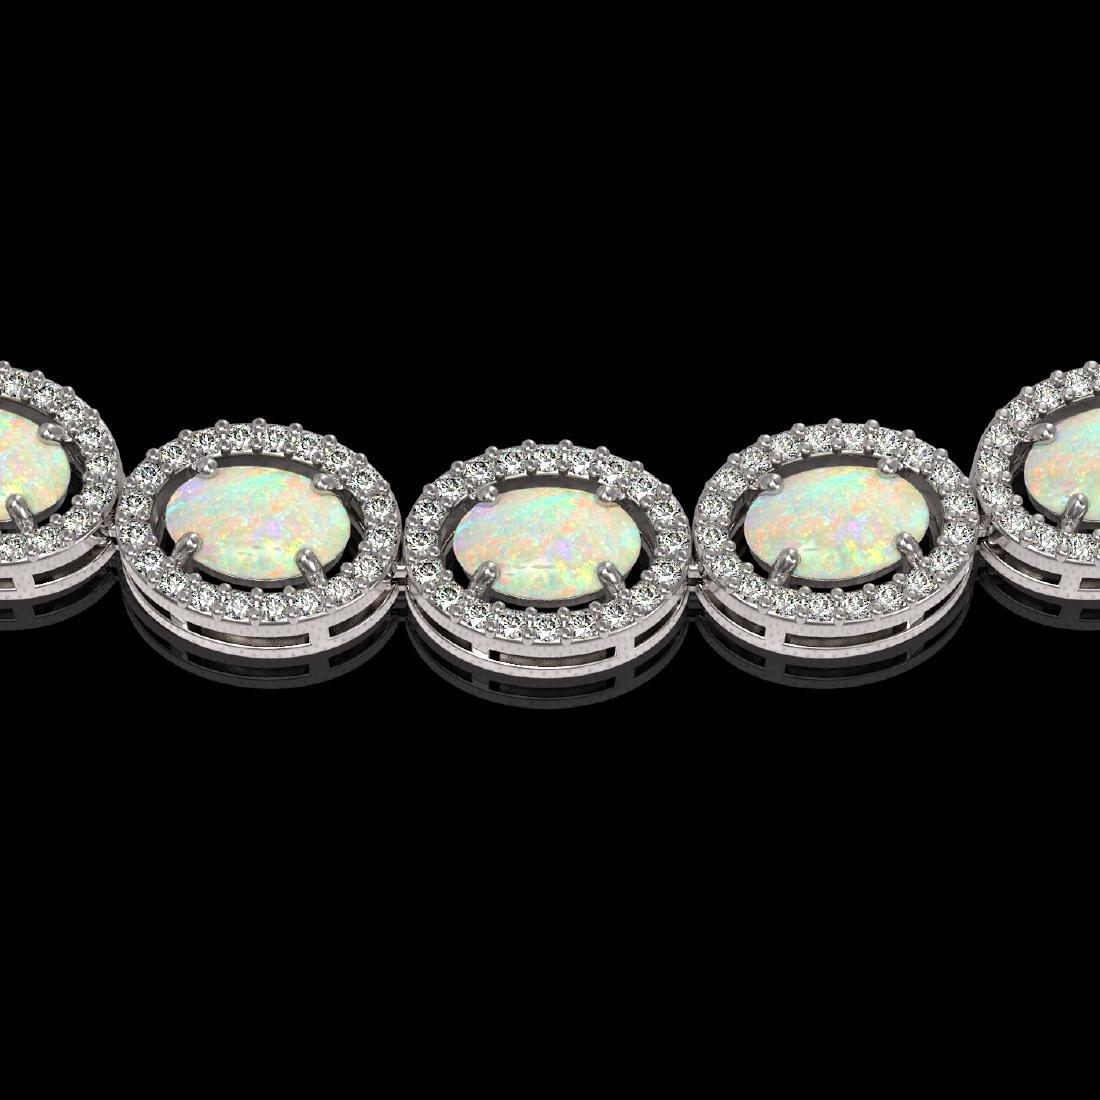 21.21 CTW Opal & Diamond Halo Necklace 10K White Gold - 3